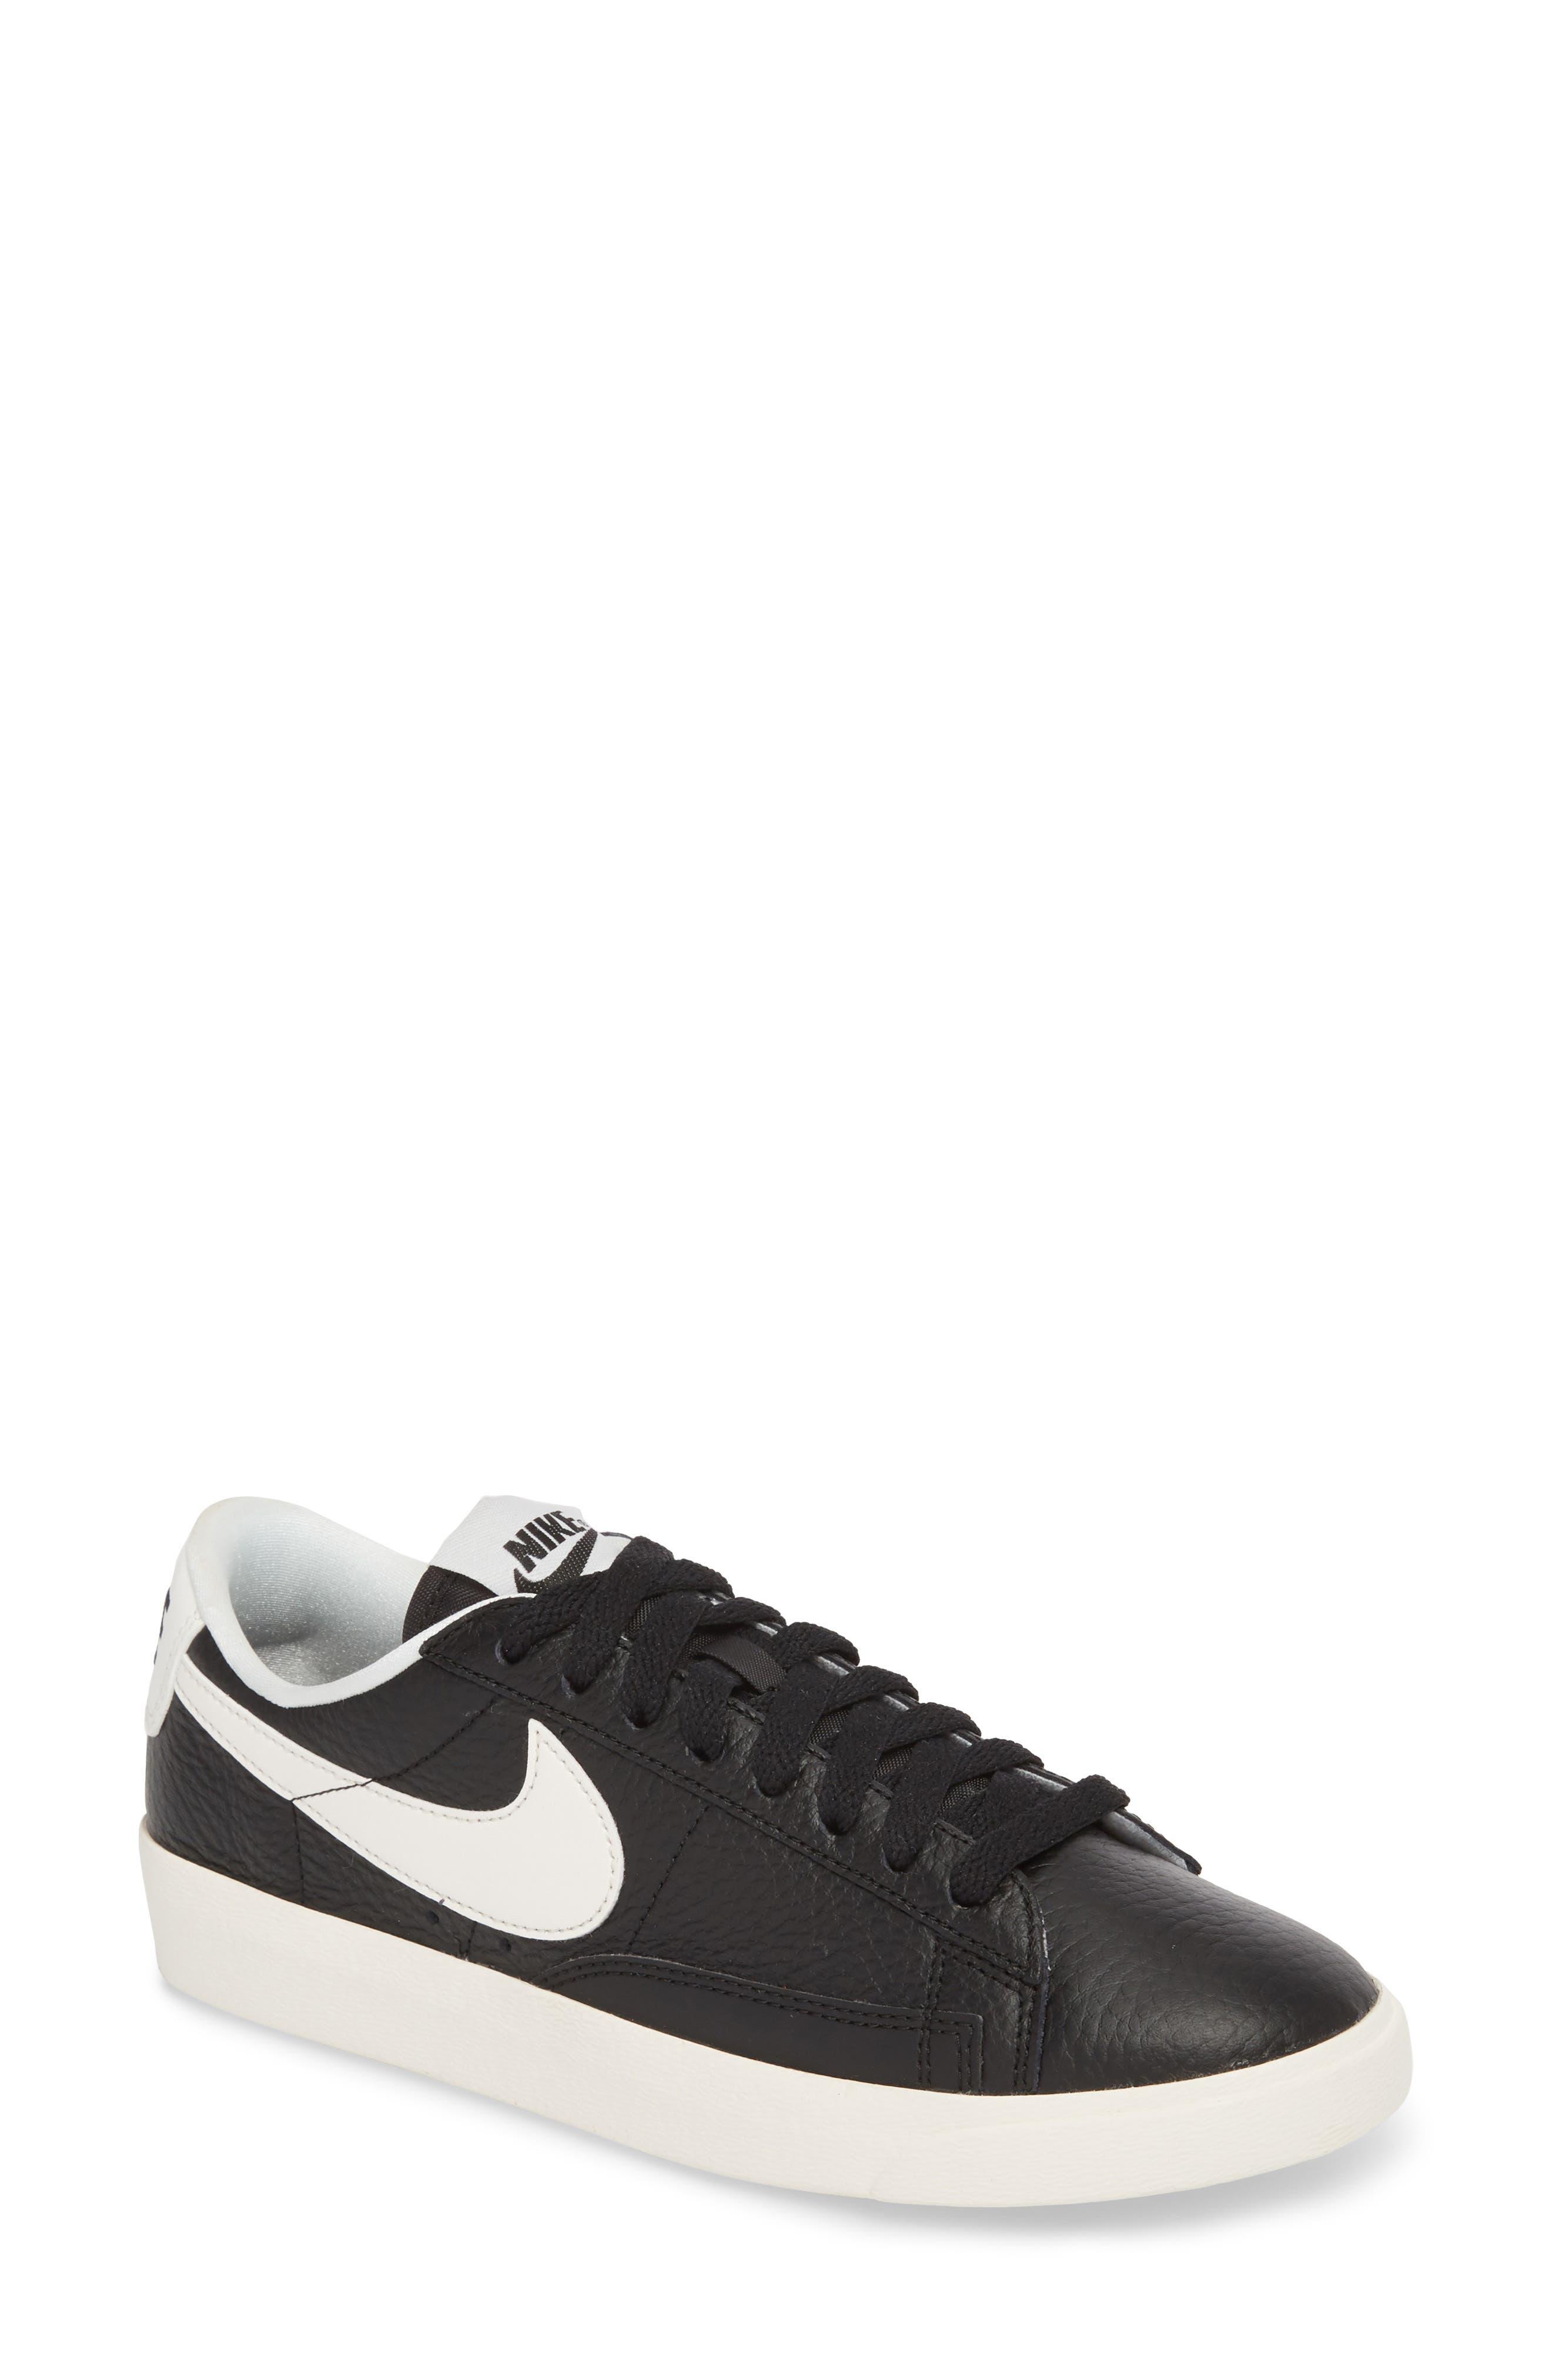 Nike Blazer Premium Low Sneaker (Women)